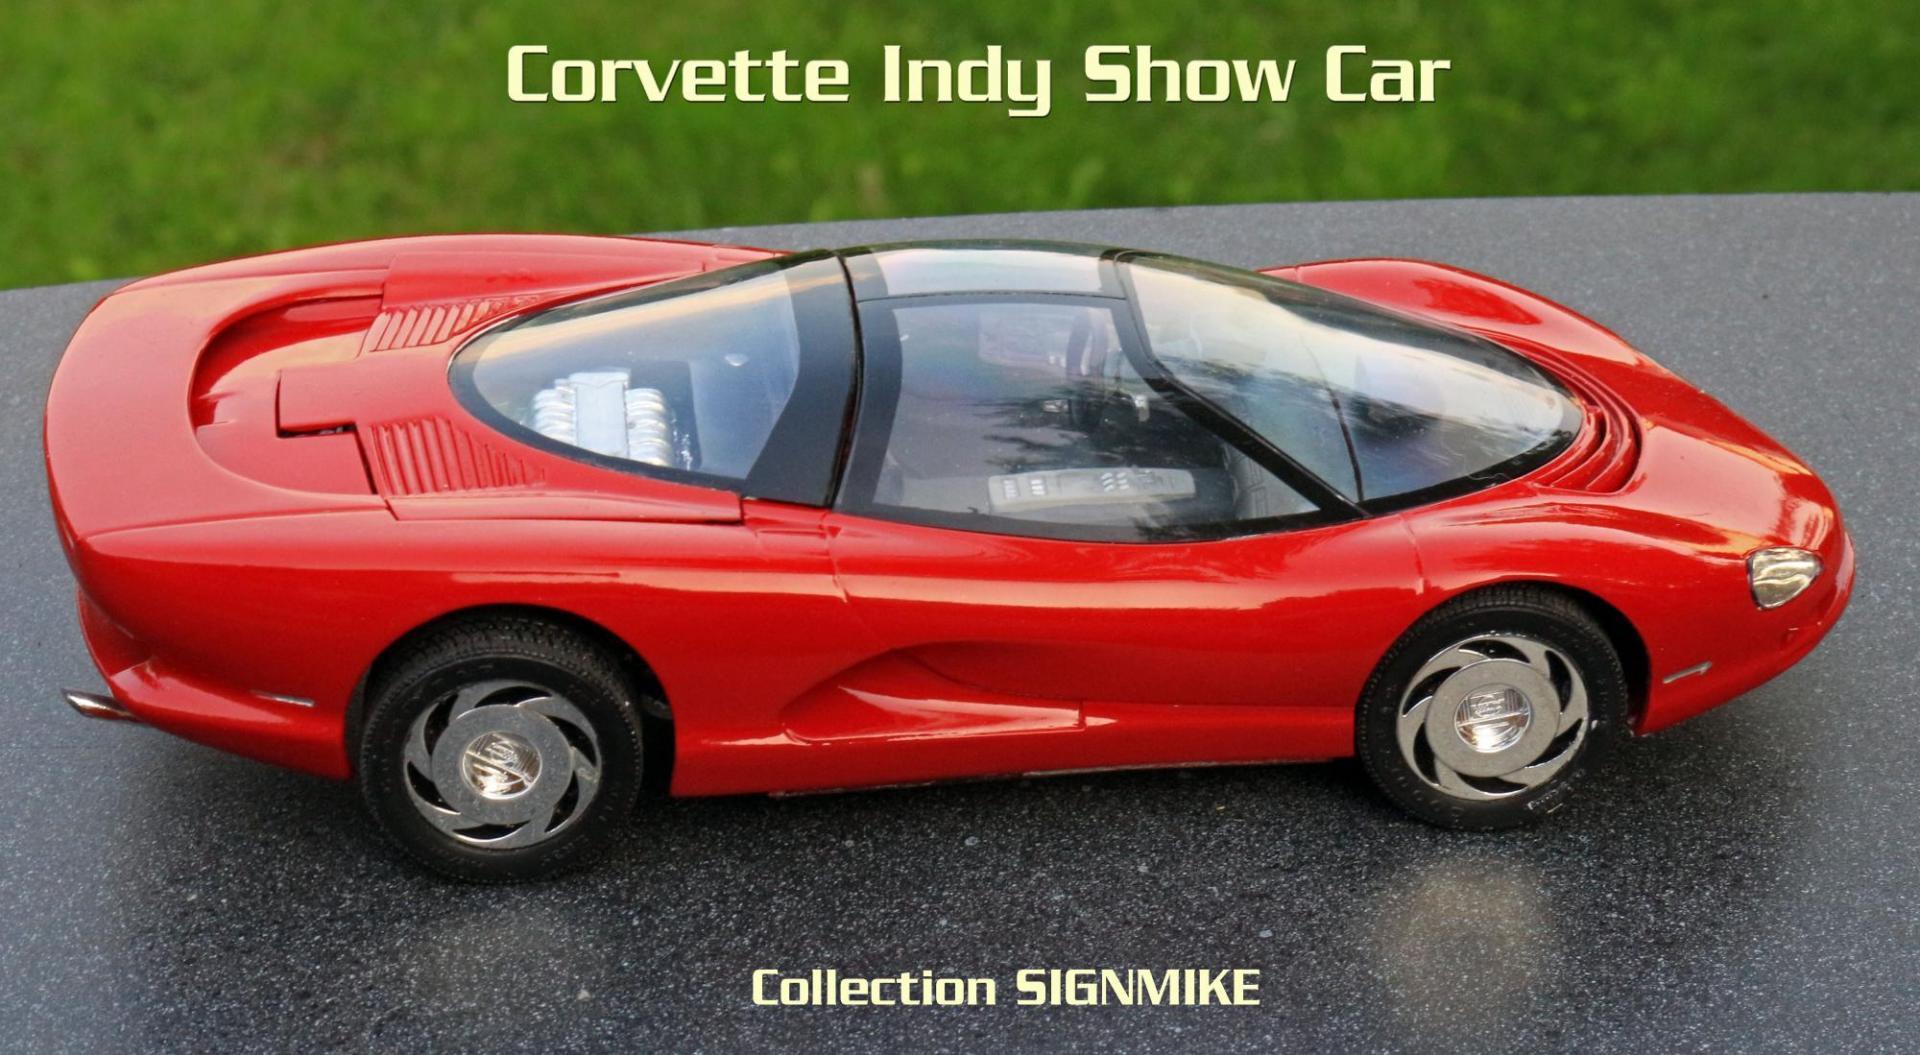 Corvette Indy Show Car (27).JPG